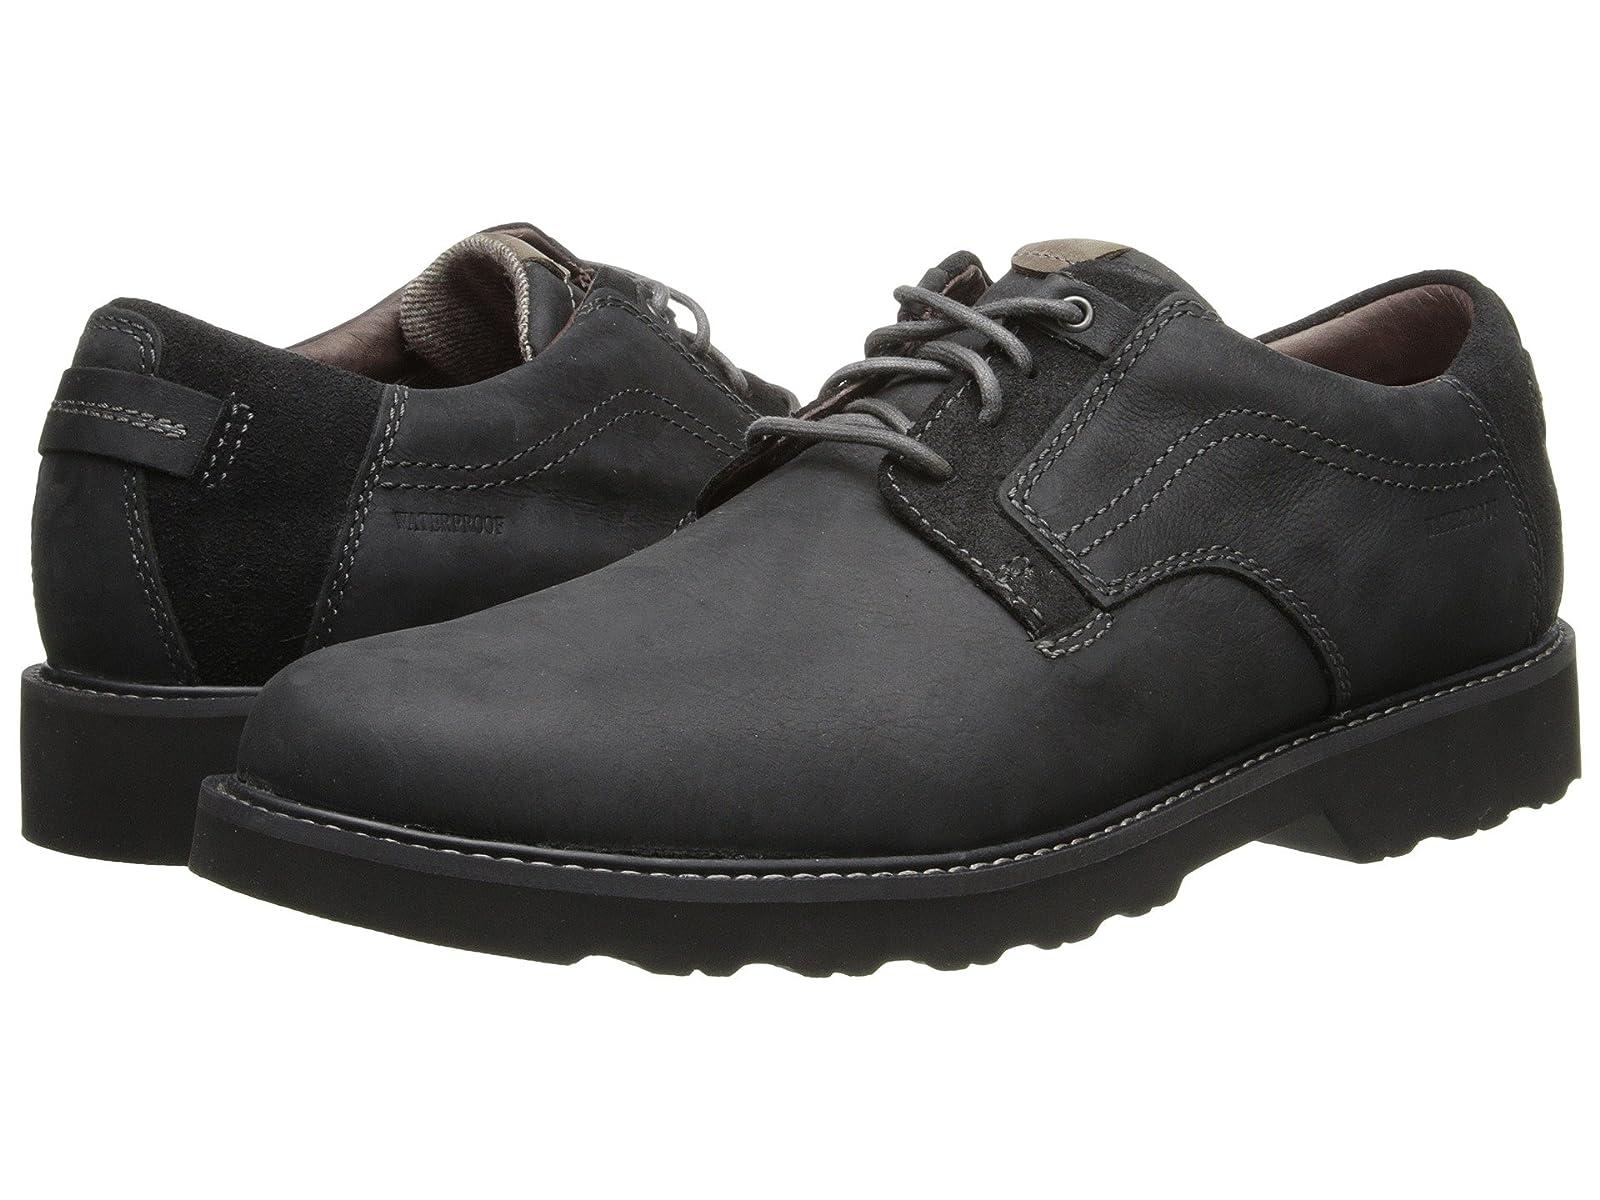 Dunham REVdusk WaterproofAtmospheric grades have affordable shoes